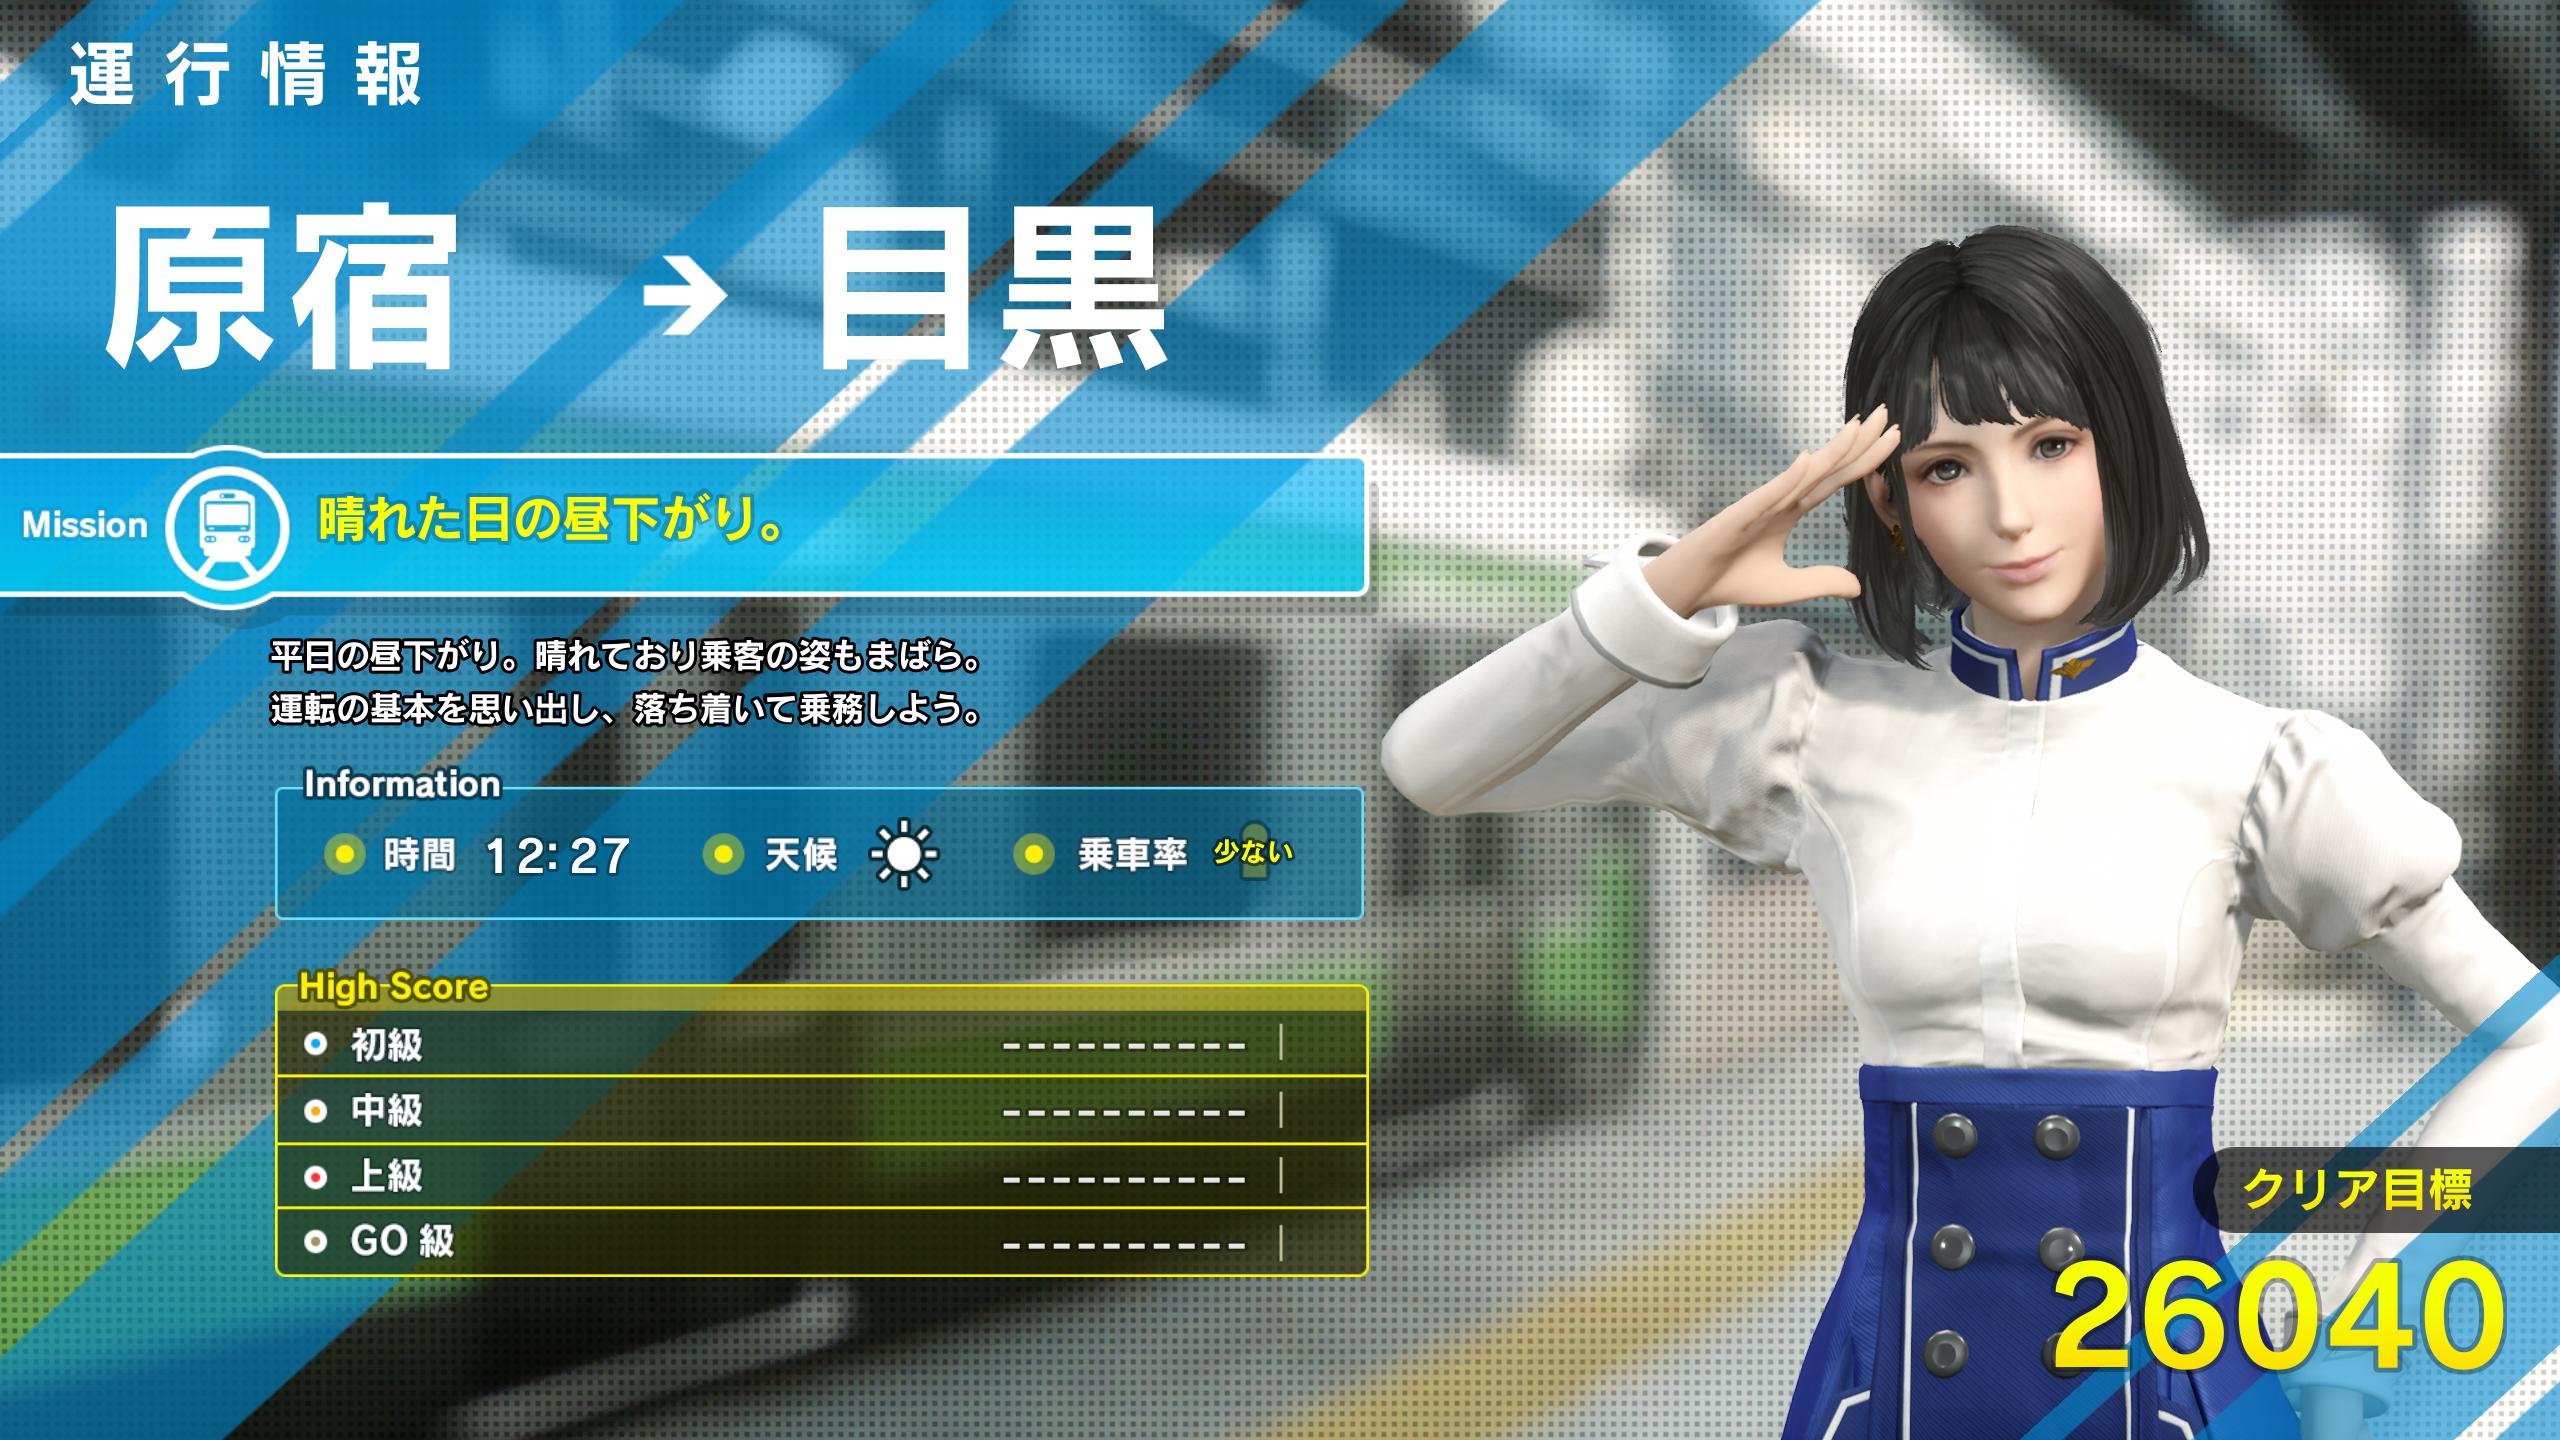 http://game.watch.impress.co.jp/img/gmw/docs/1084/738/dengo11_03.jpg